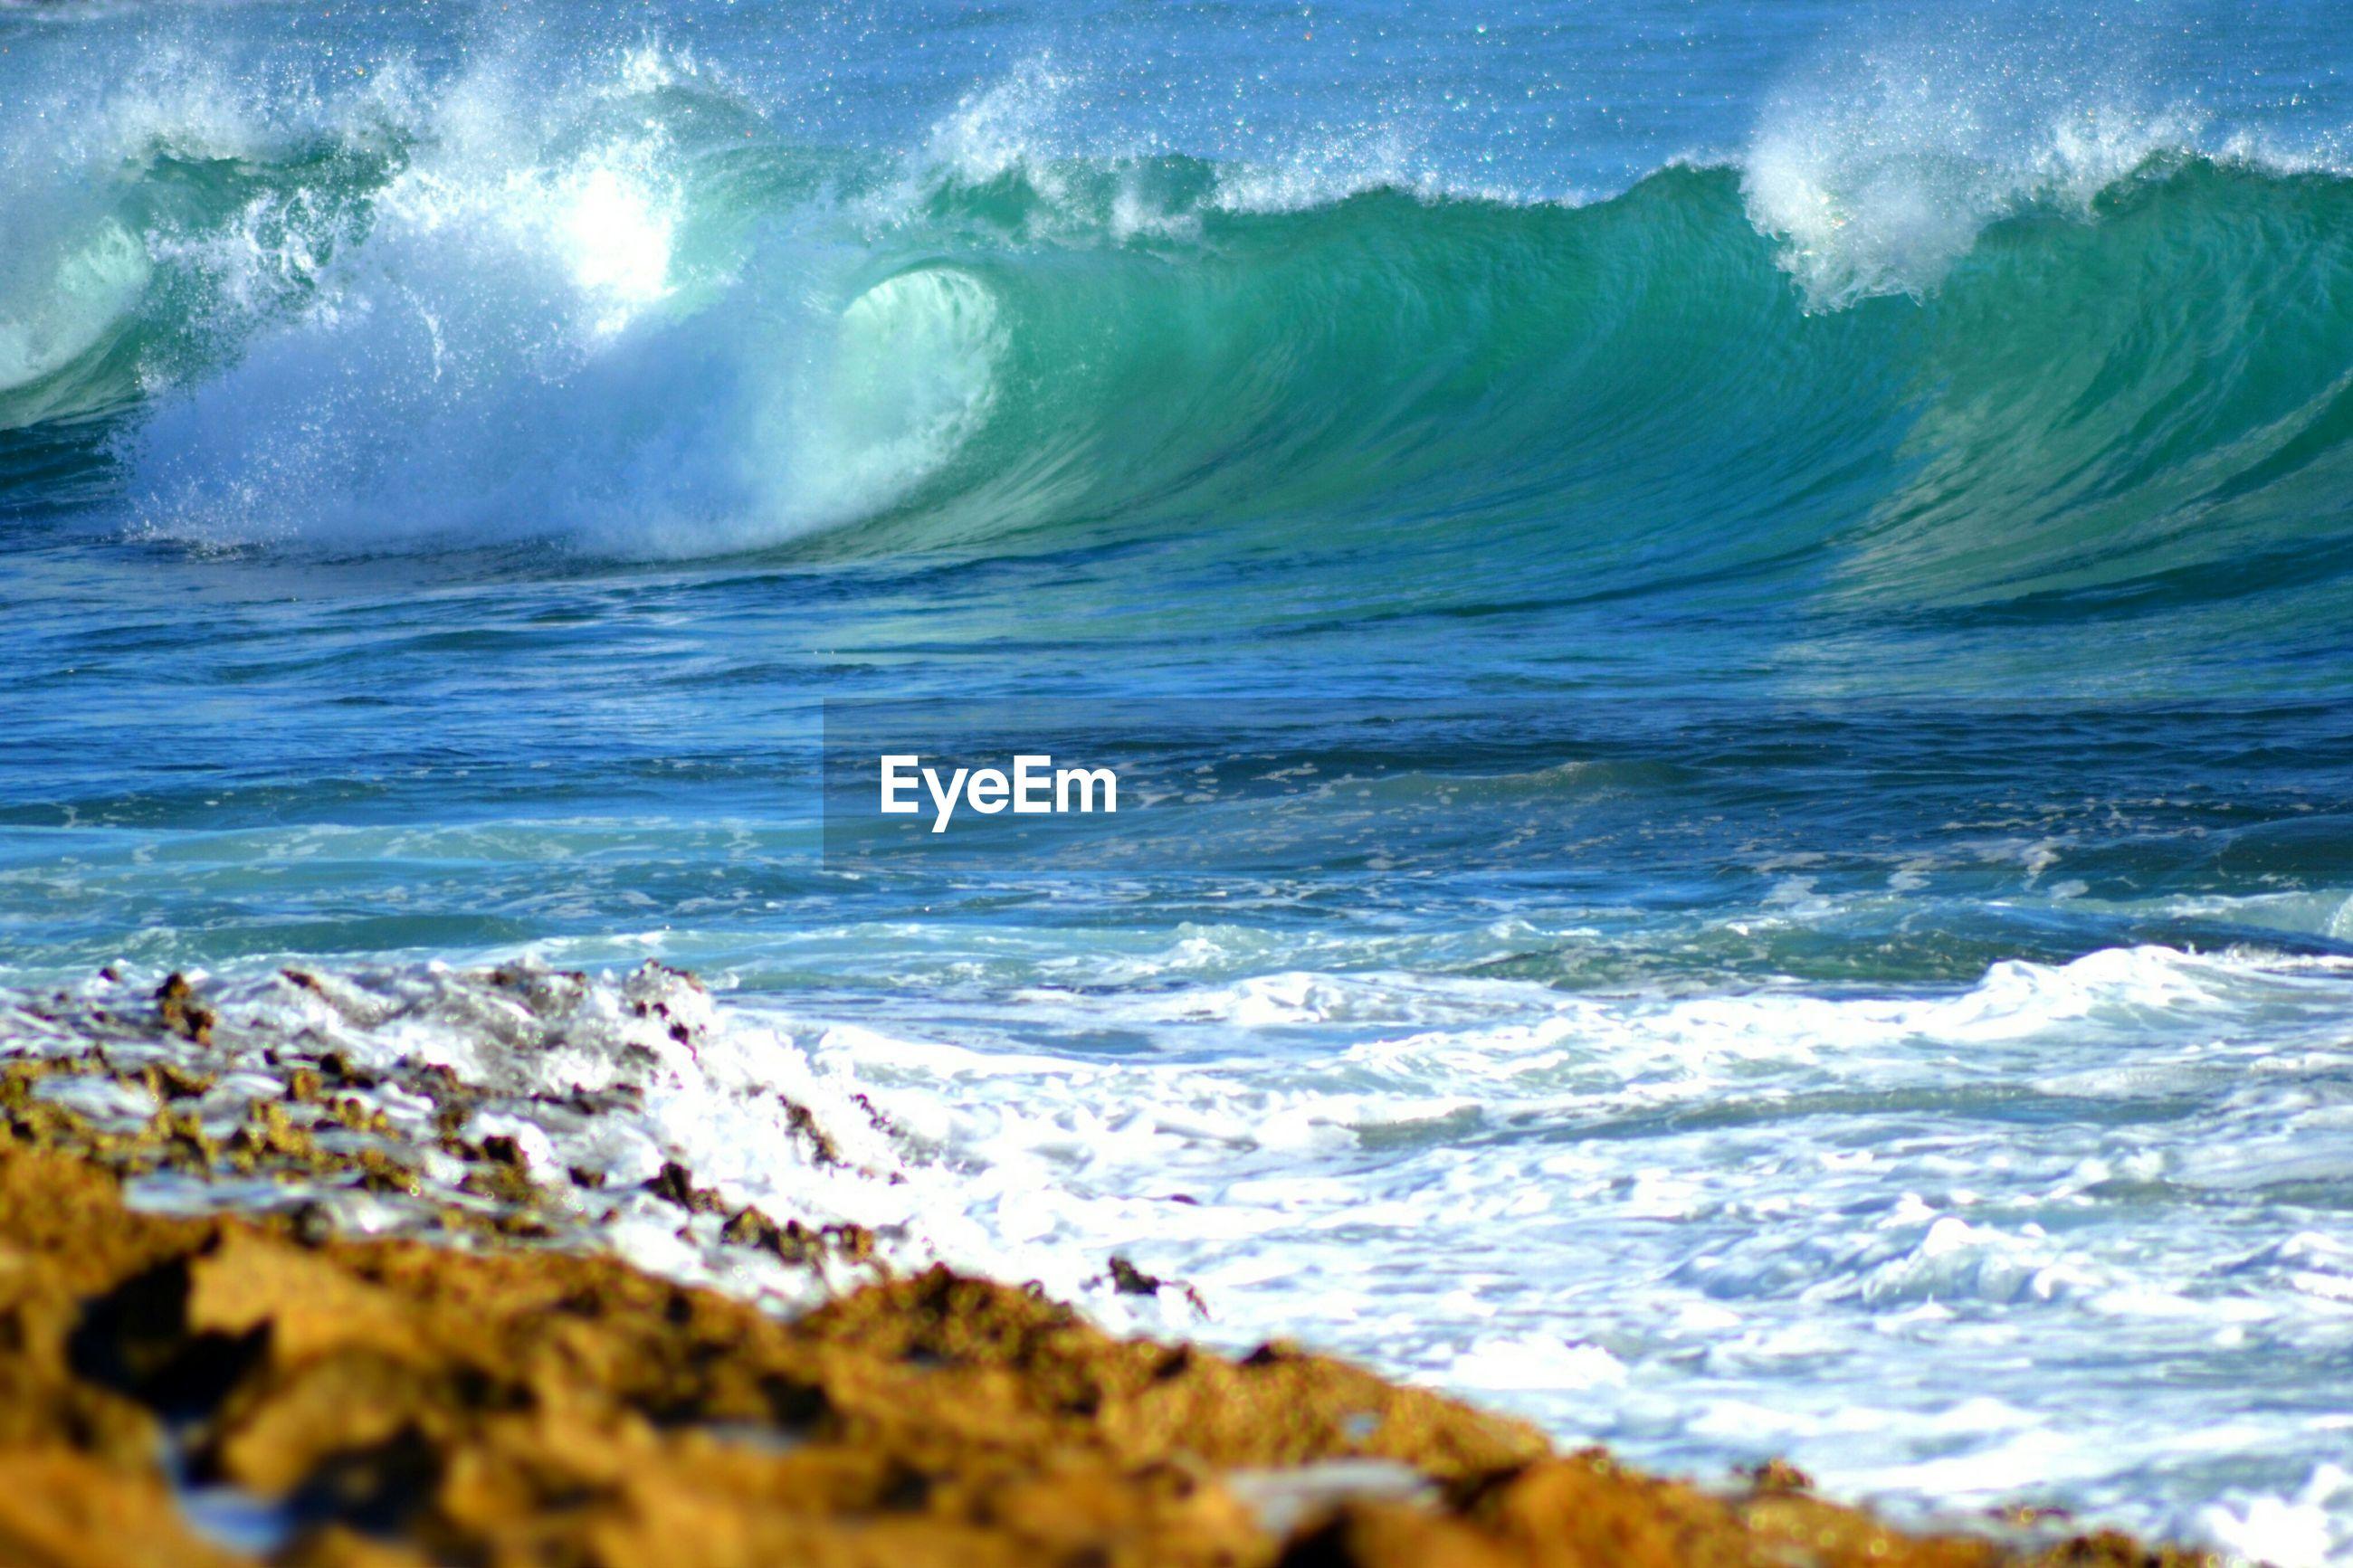 Sea waves leading towards shore